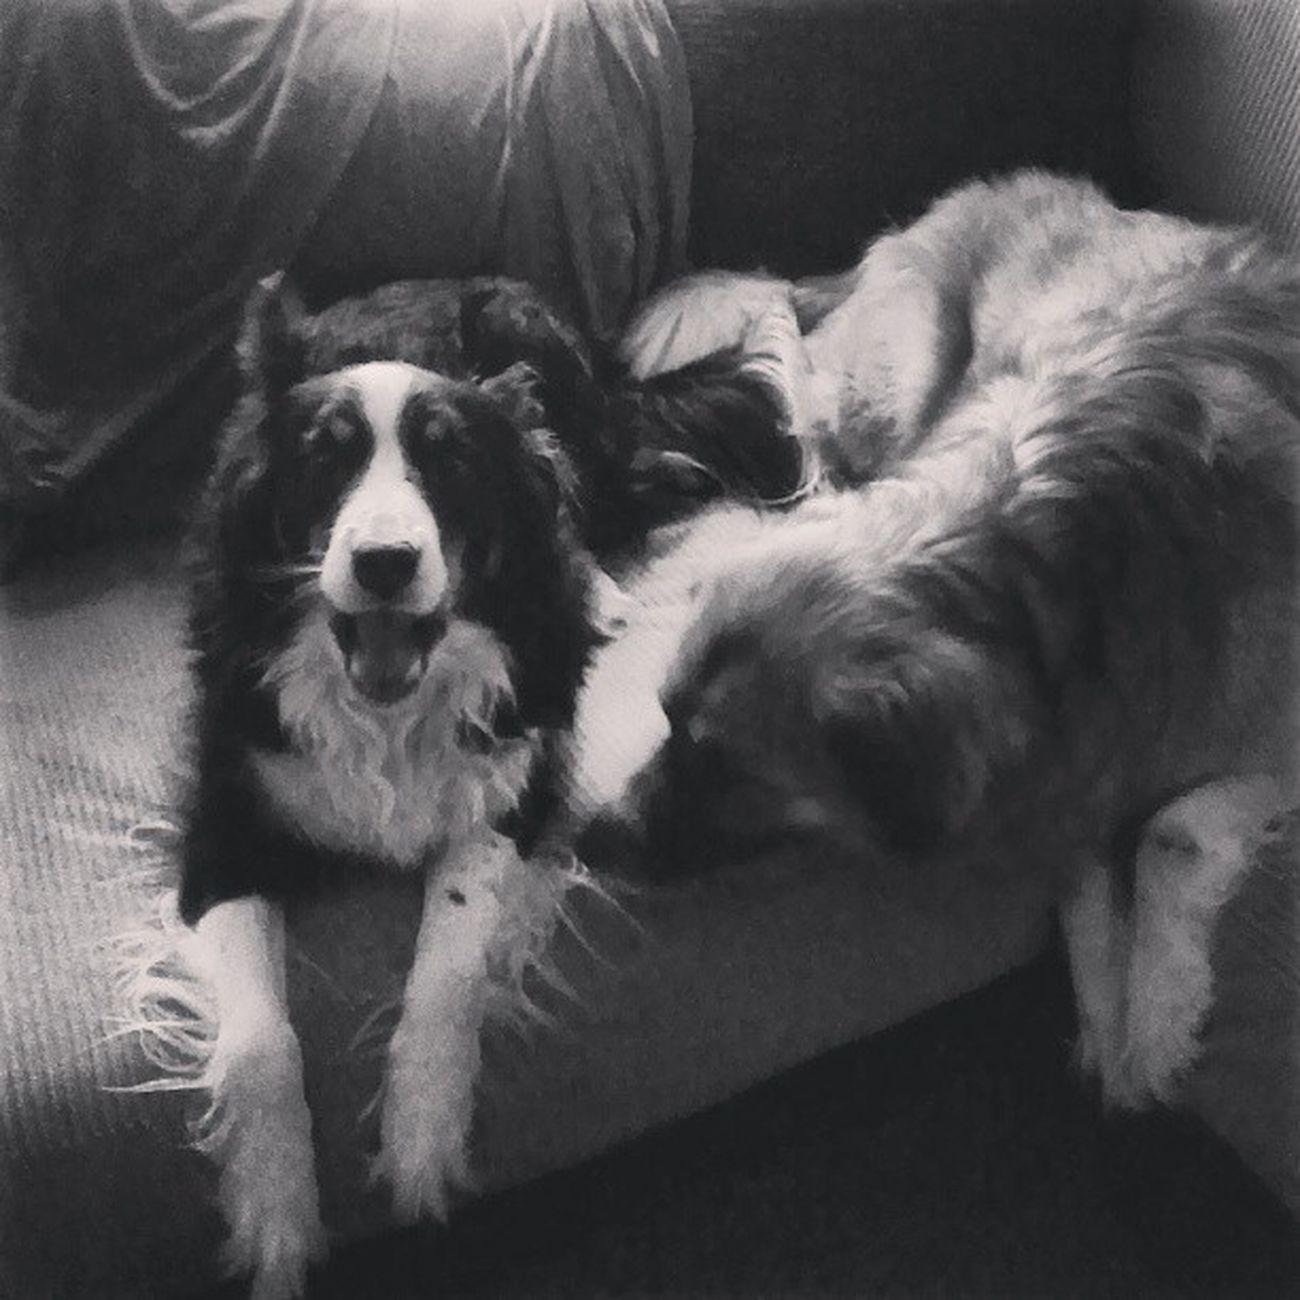 Dogsofinstagram Furkids Bordercollie  Lucy. Saintbernard husky Sasha. sissy sisters mybabies